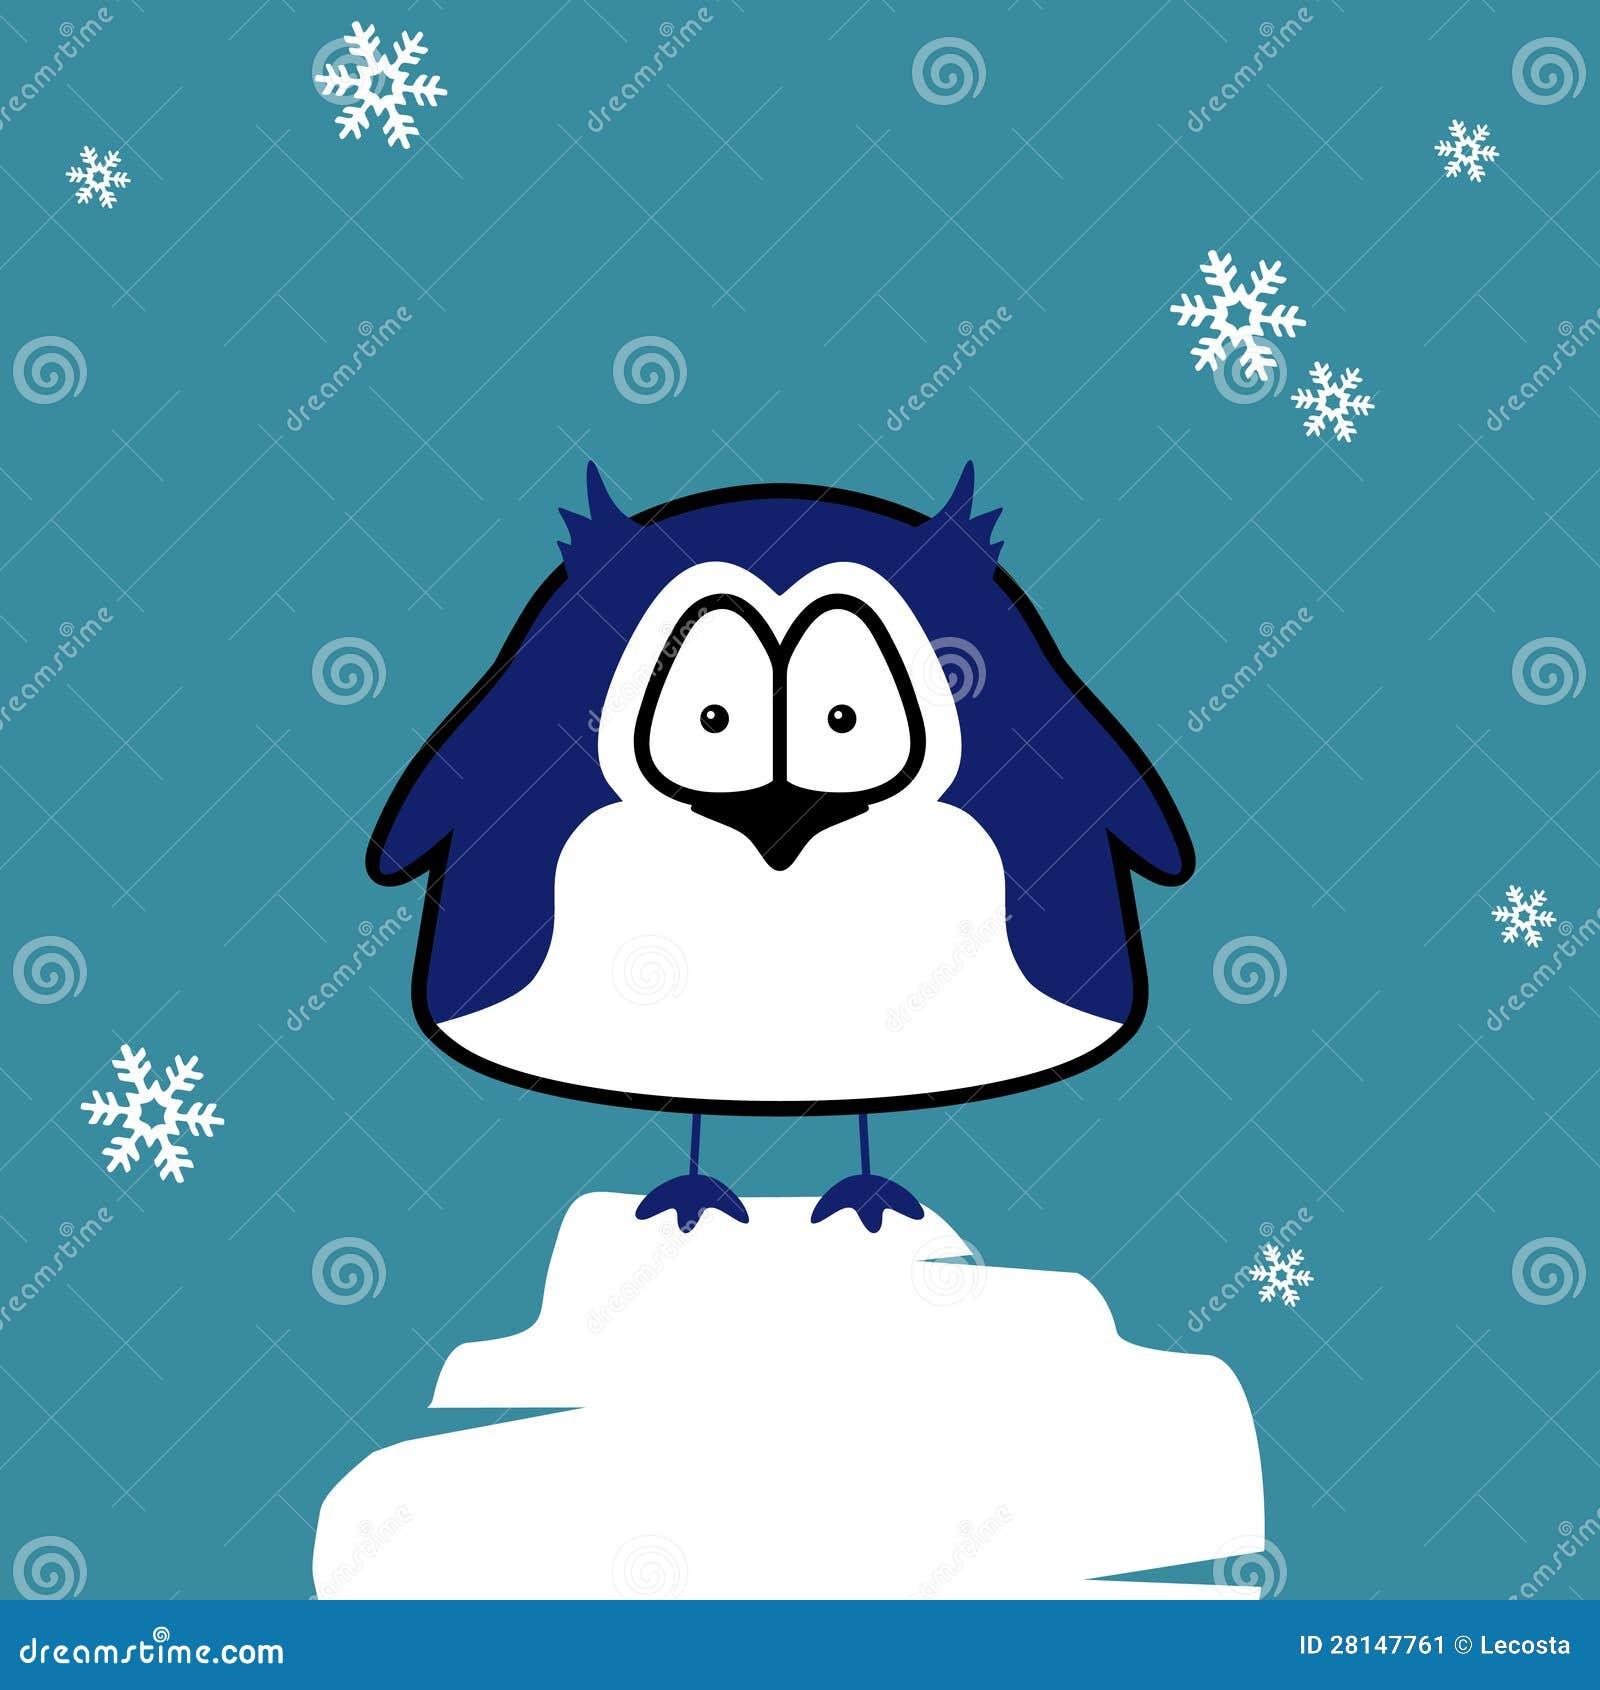 pingouin sur la banquise image stock image 28147761. Black Bedroom Furniture Sets. Home Design Ideas